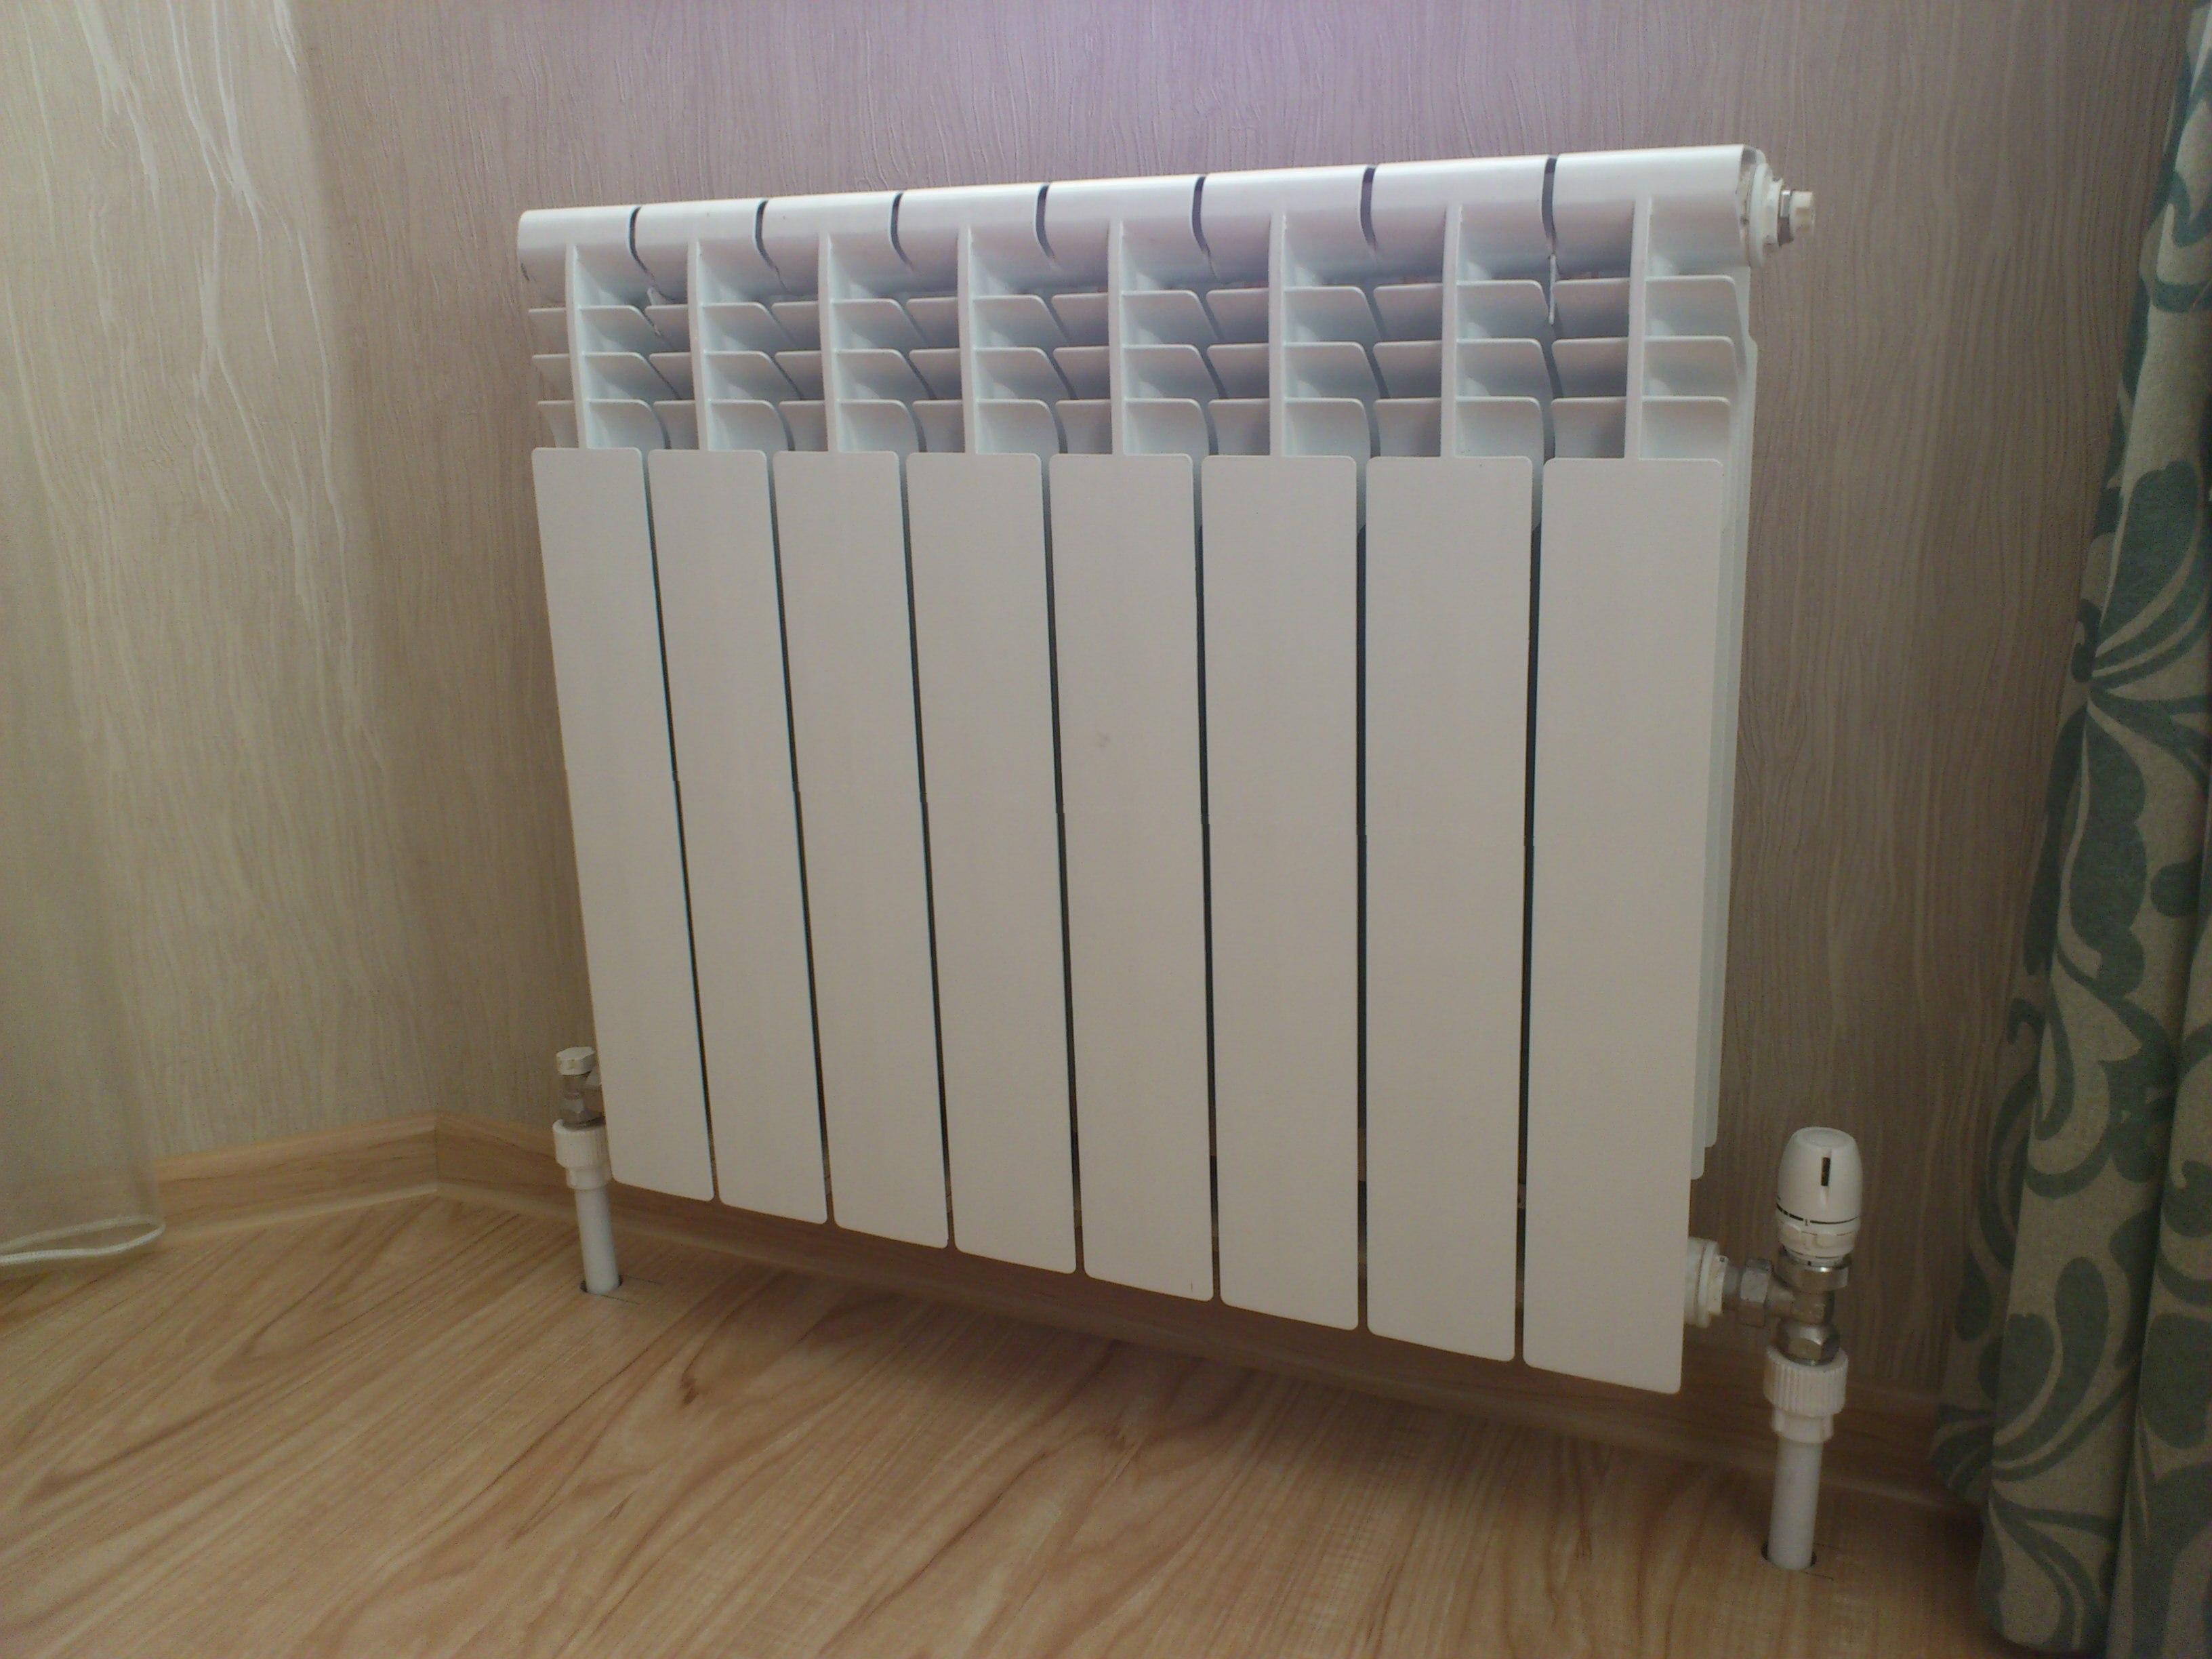 quel marque de radiateur a inertie choisir avignon. Black Bedroom Furniture Sets. Home Design Ideas